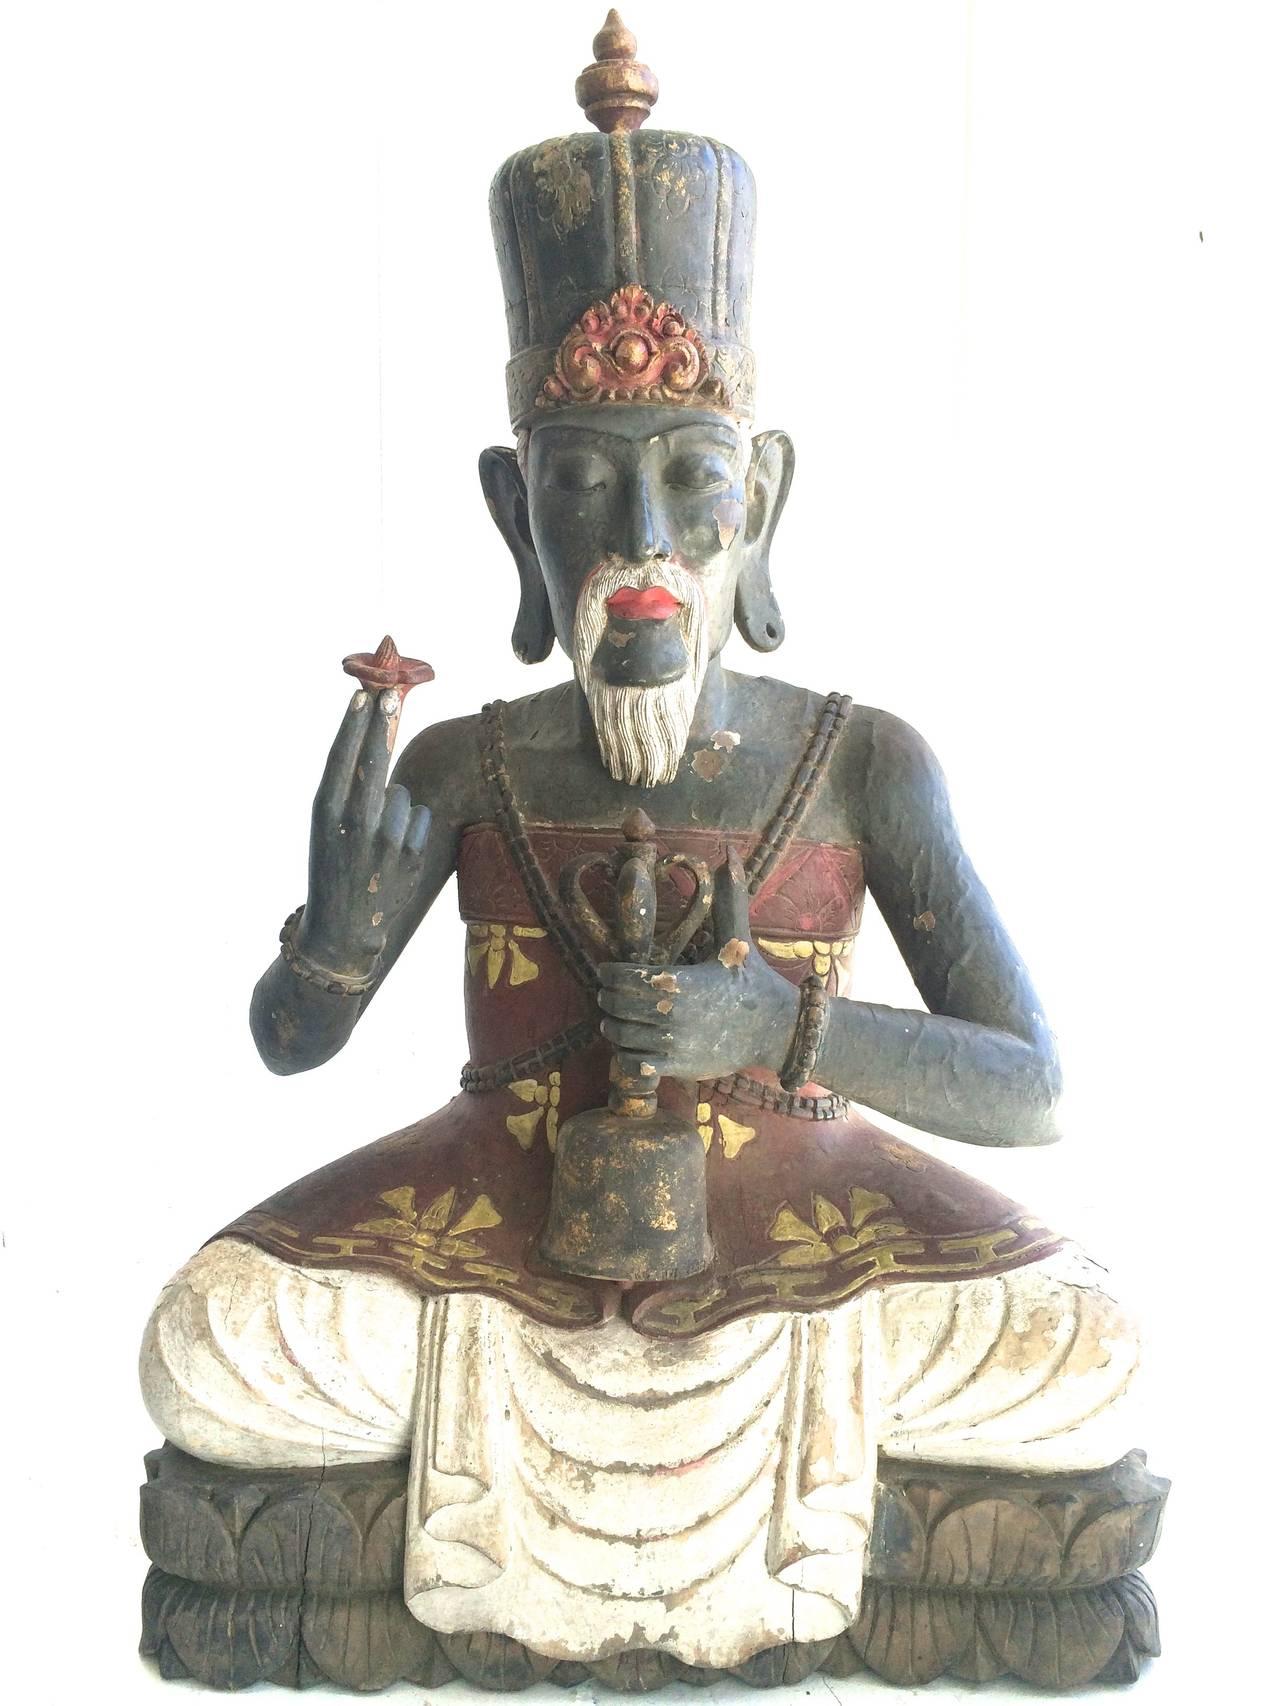 Unknown Figurative Sculpture - Antique High Priest Sitting on Lotus Wood Sculpture Bali